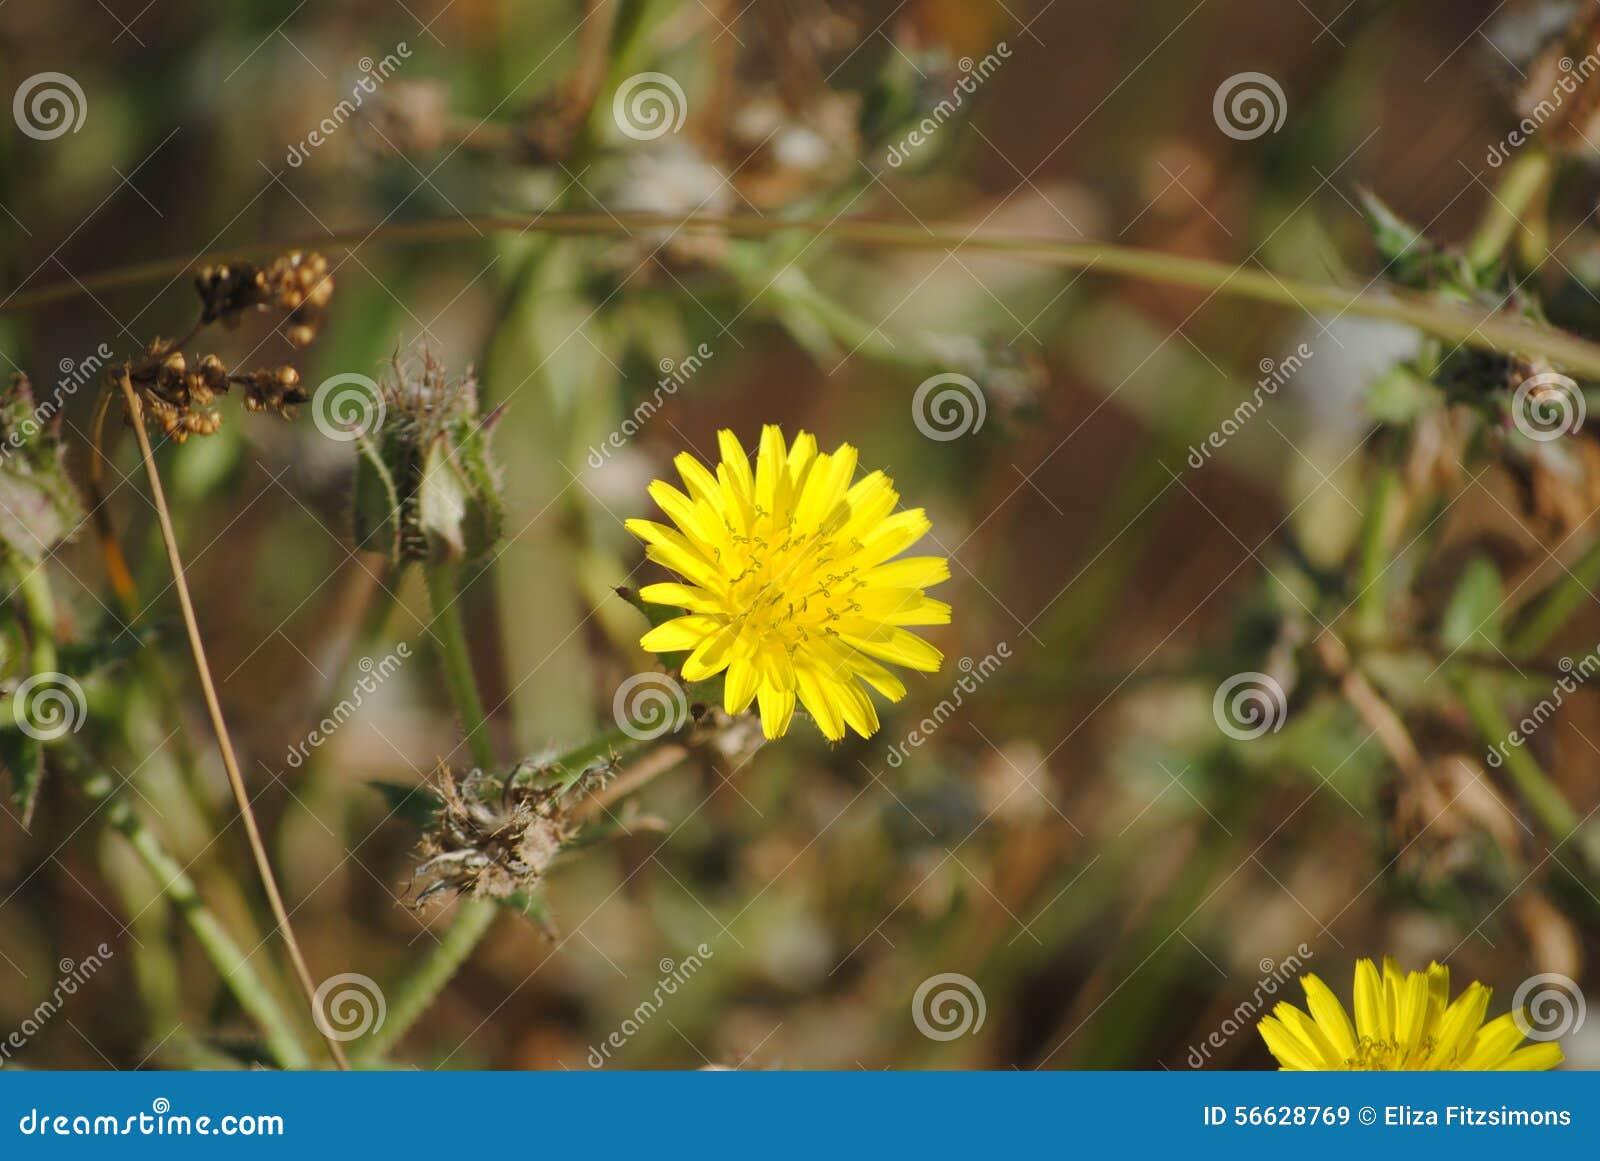 Fleur jaune de mauvaise herbe de hawkweed photo stock - Mauvaise herbe fleur jaune ...